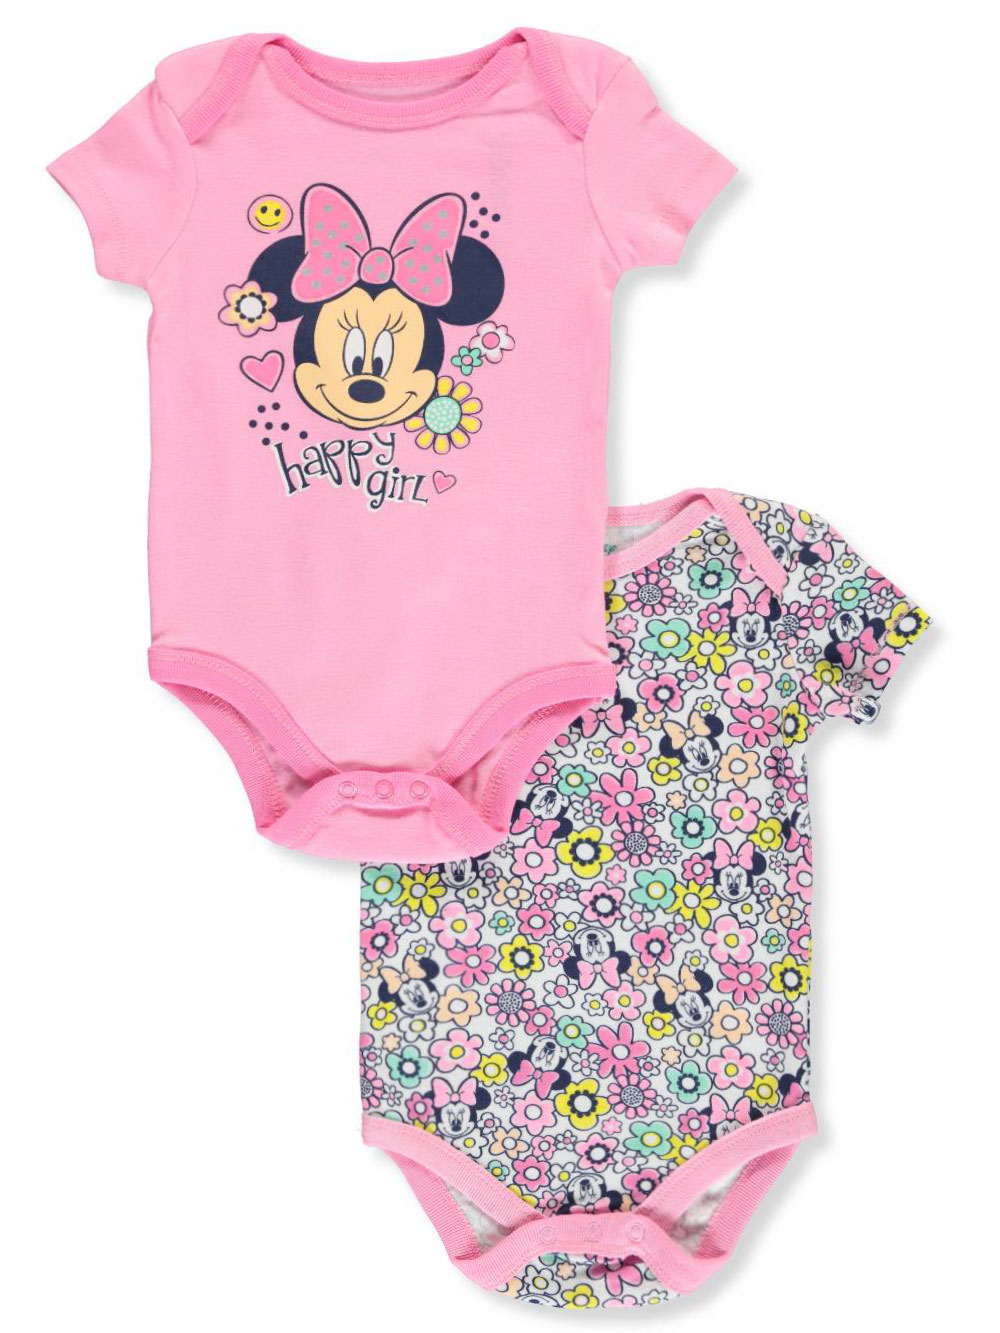 b5c7d72678df5 Disney Minnie Mouse Baby Girls' 2-Pack Bodysuits